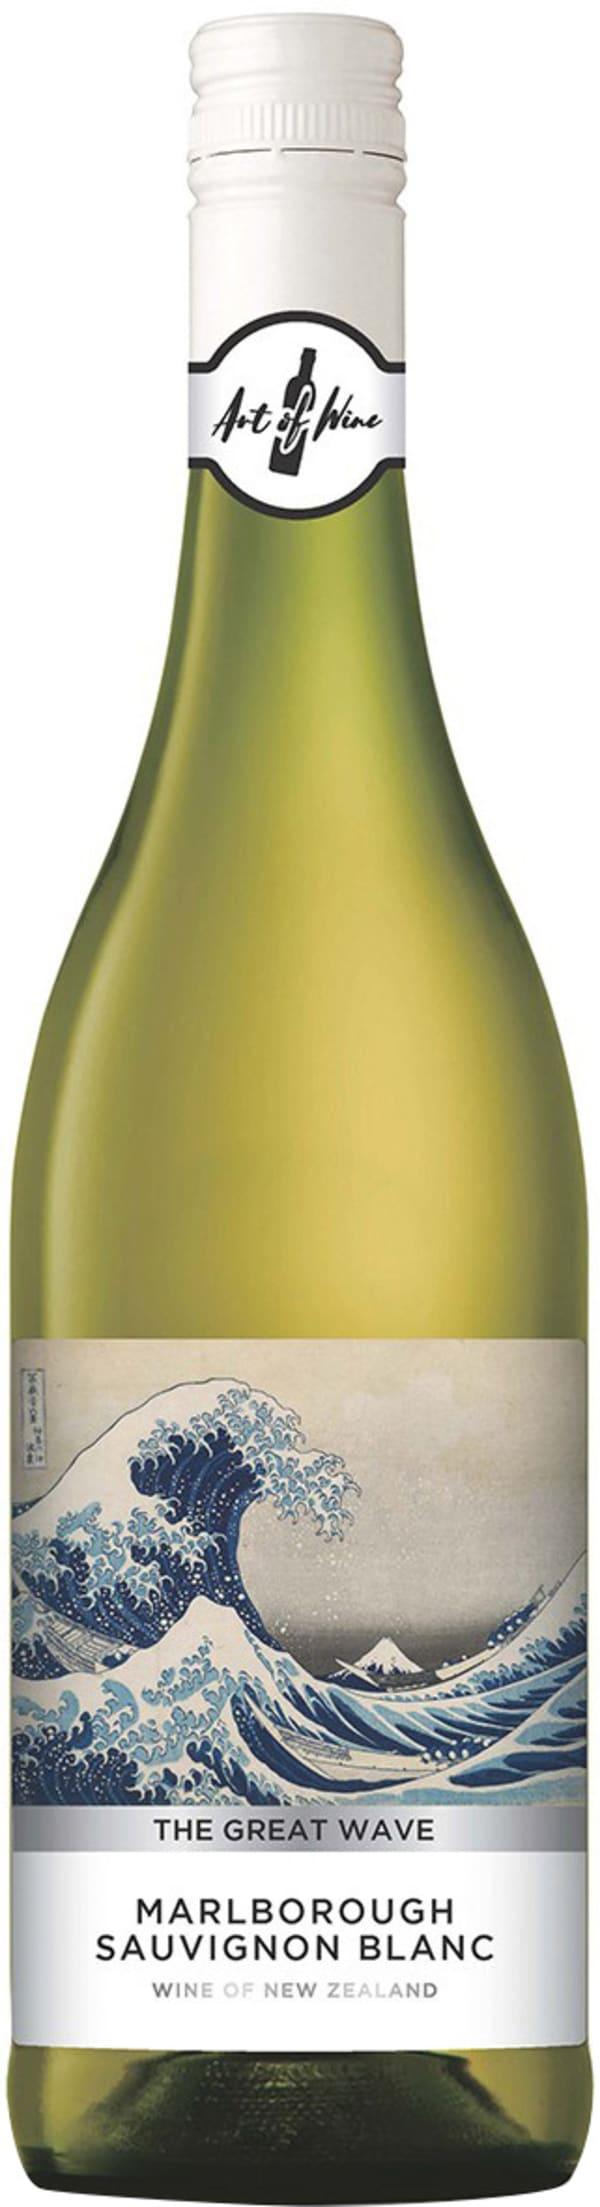 The Great Wave Sauvignon Blanc 2019